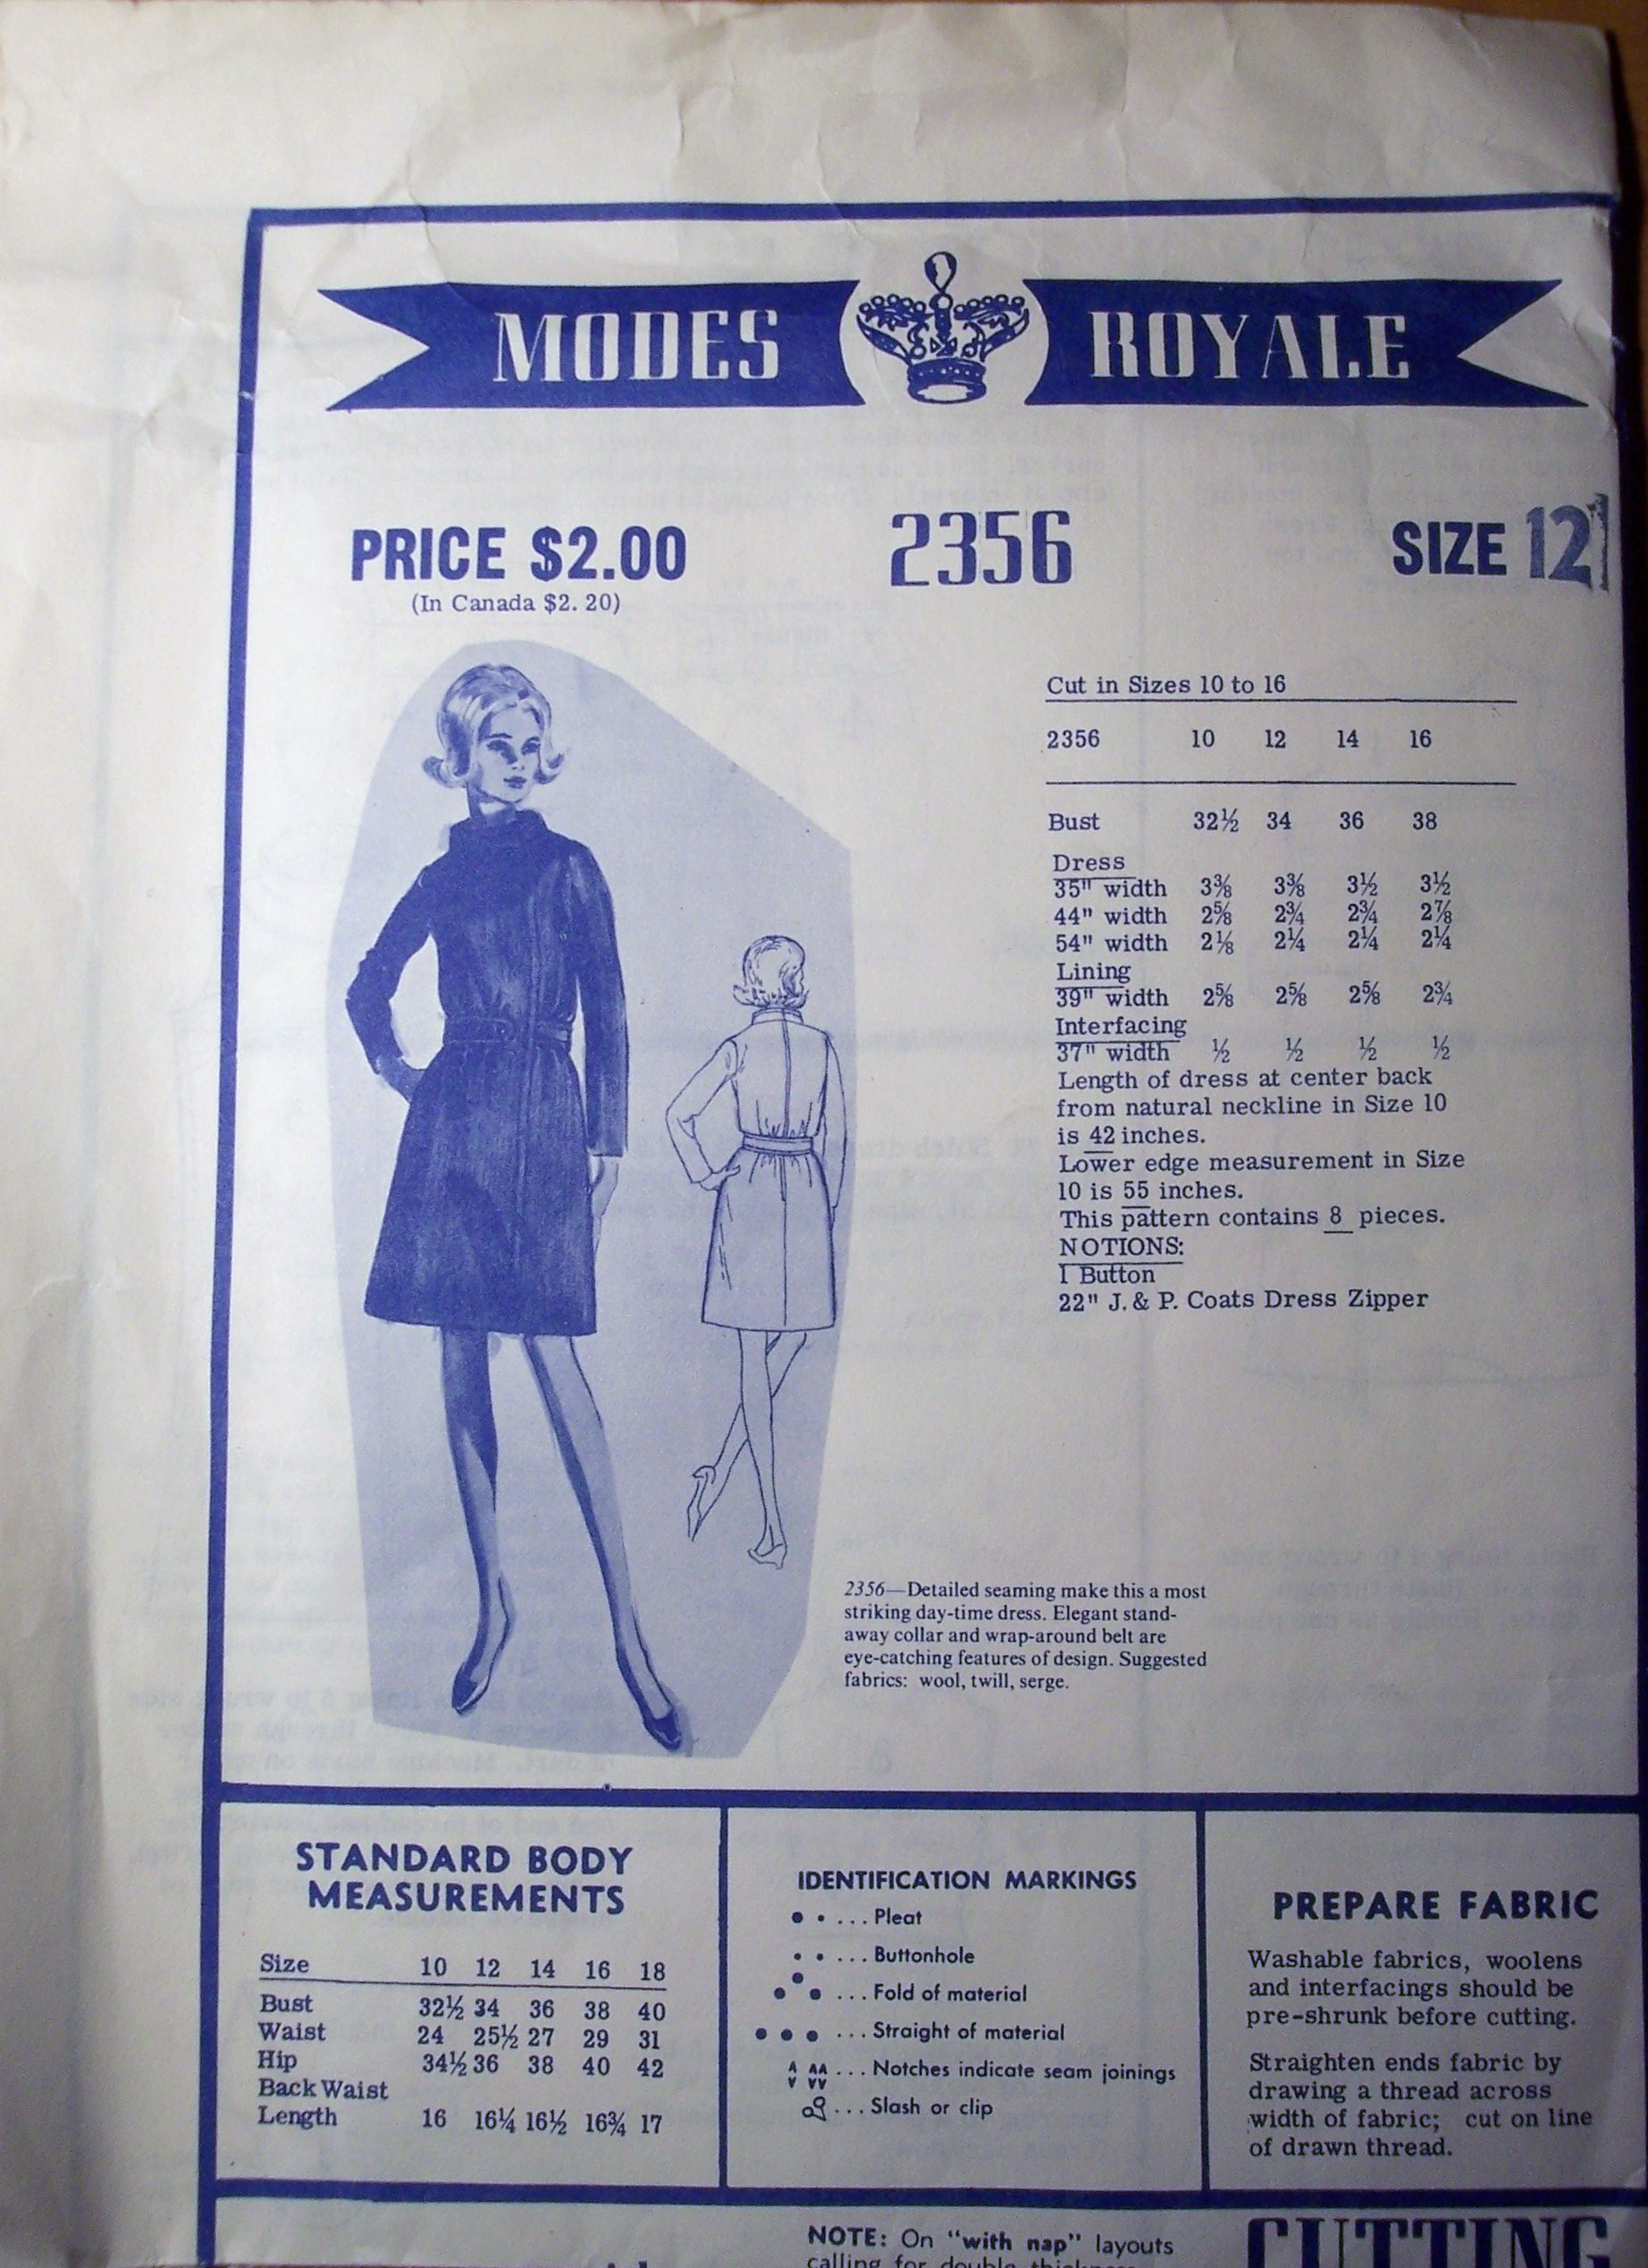 Modes Royale 2356